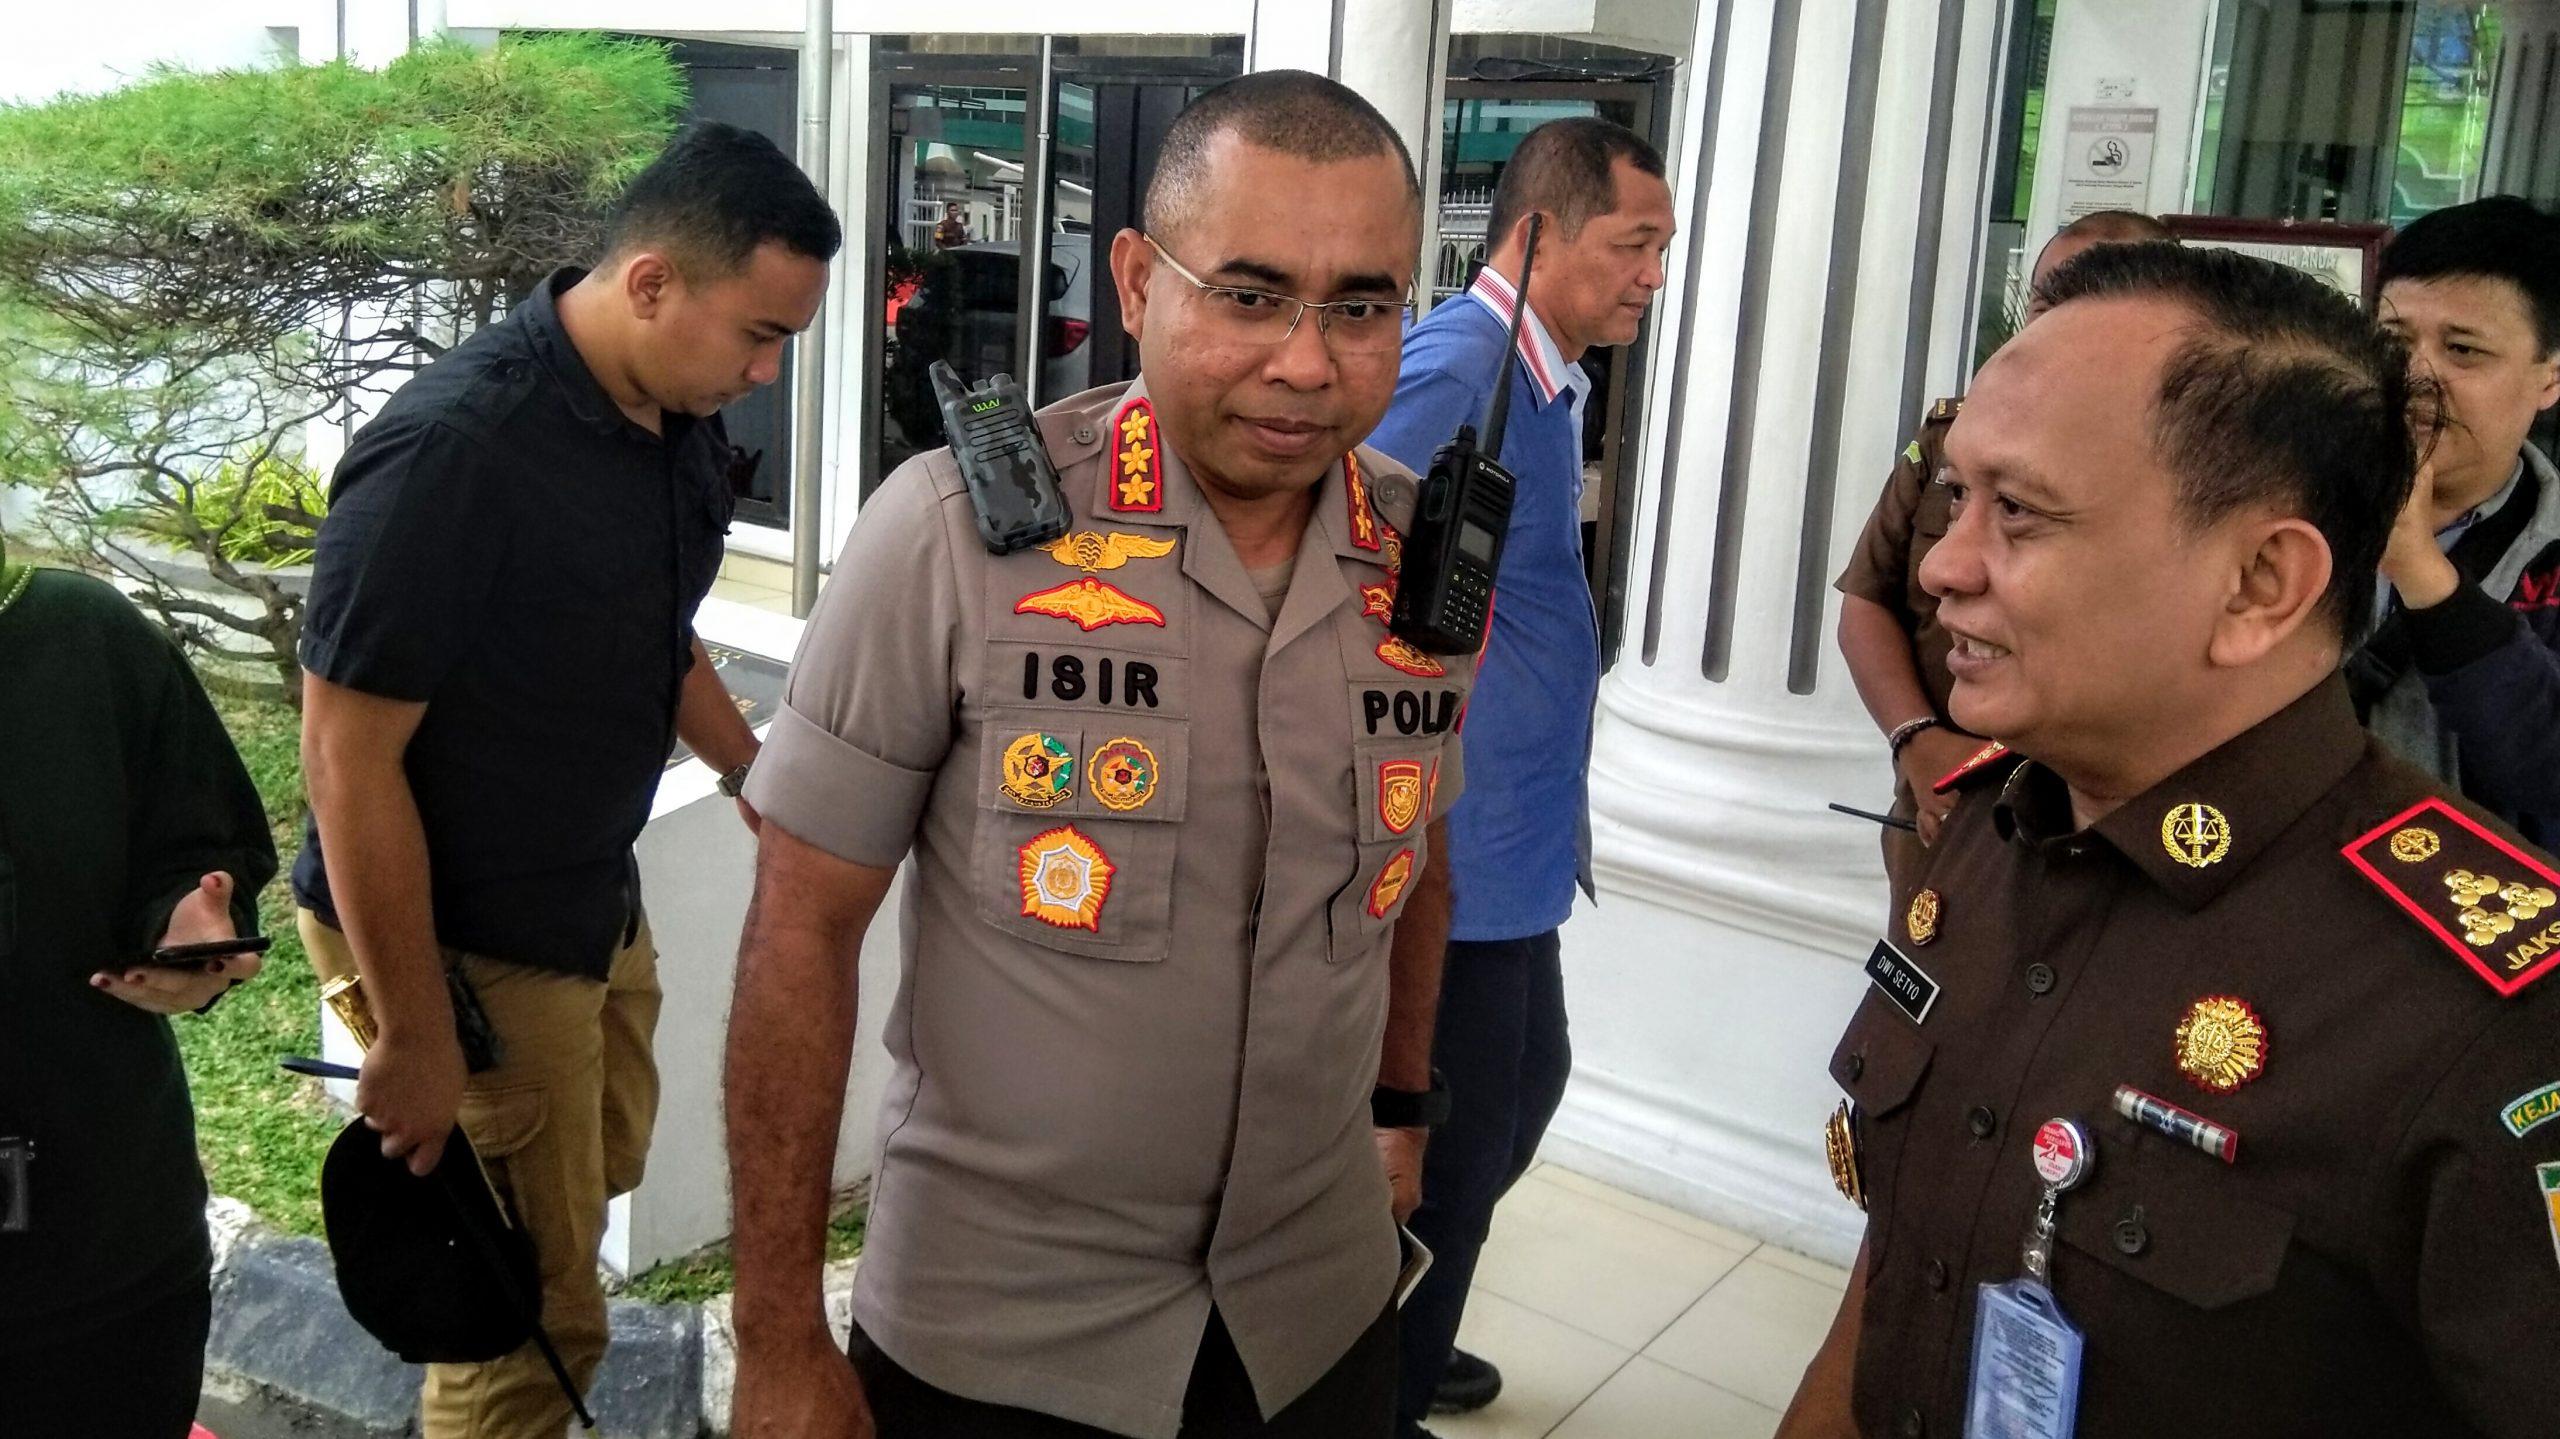 Kapolrestabes Medan Komisaris Besar Polisi Johnny Eddizon Isir (tengah) saat kunjungi kantor Kejaksaan Negeri Medan. Foto: Rakyatsumut.com / Ucis